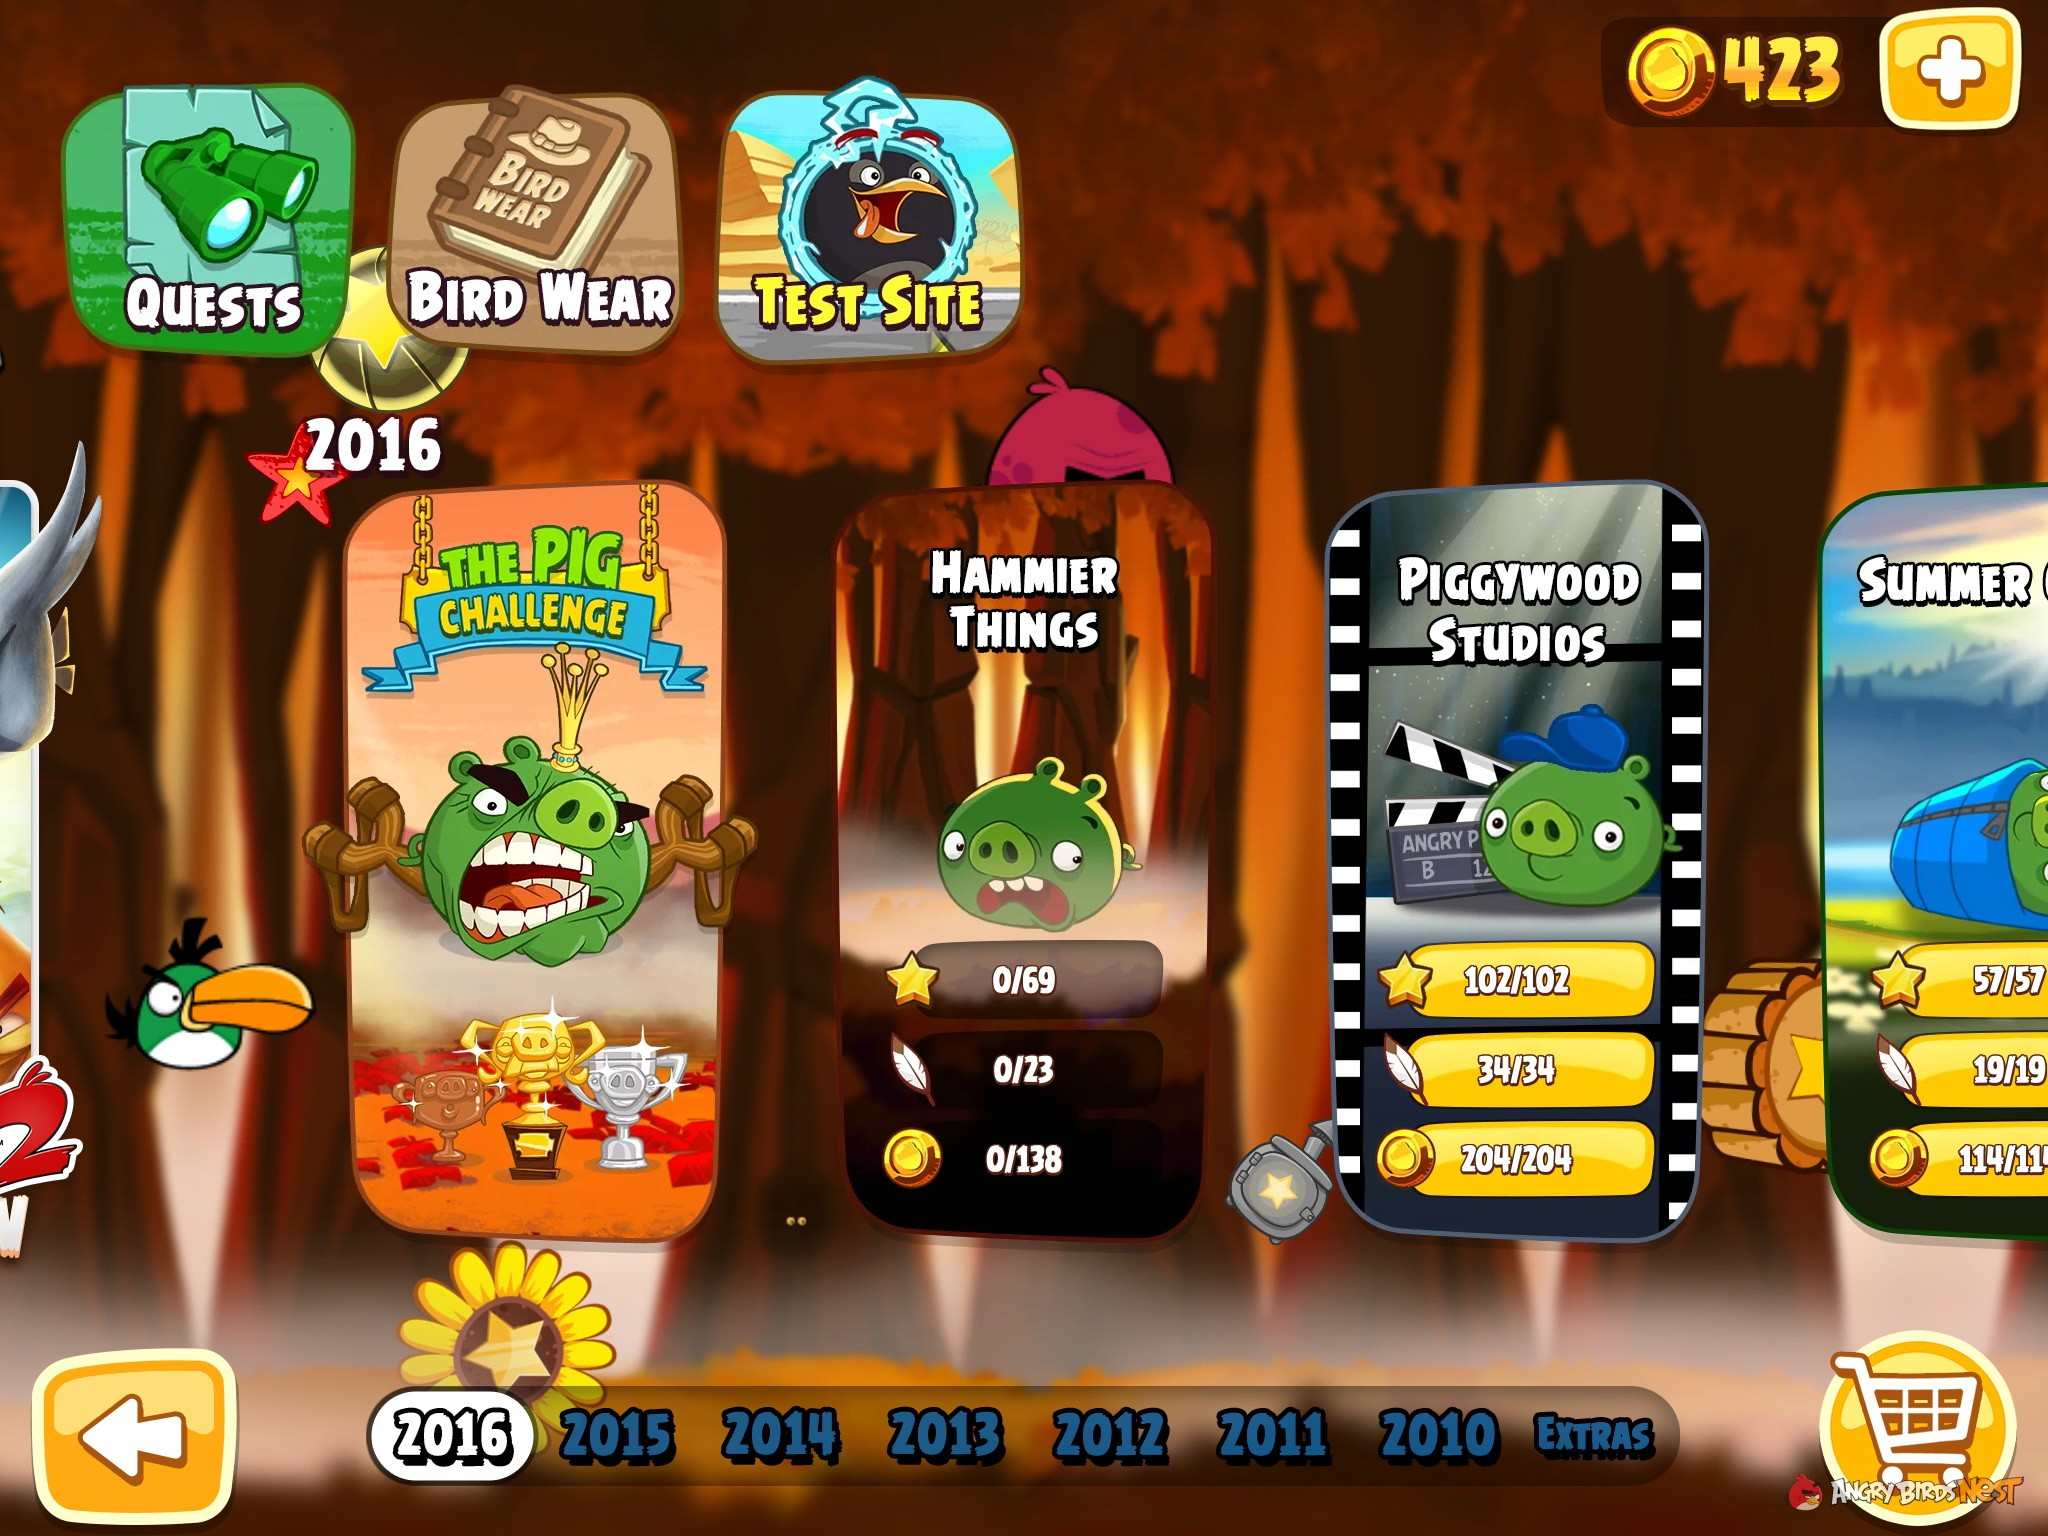 Angry Birds Hammier Things angry-birds-seasons-hammier-things-episode | angrybirdsnest